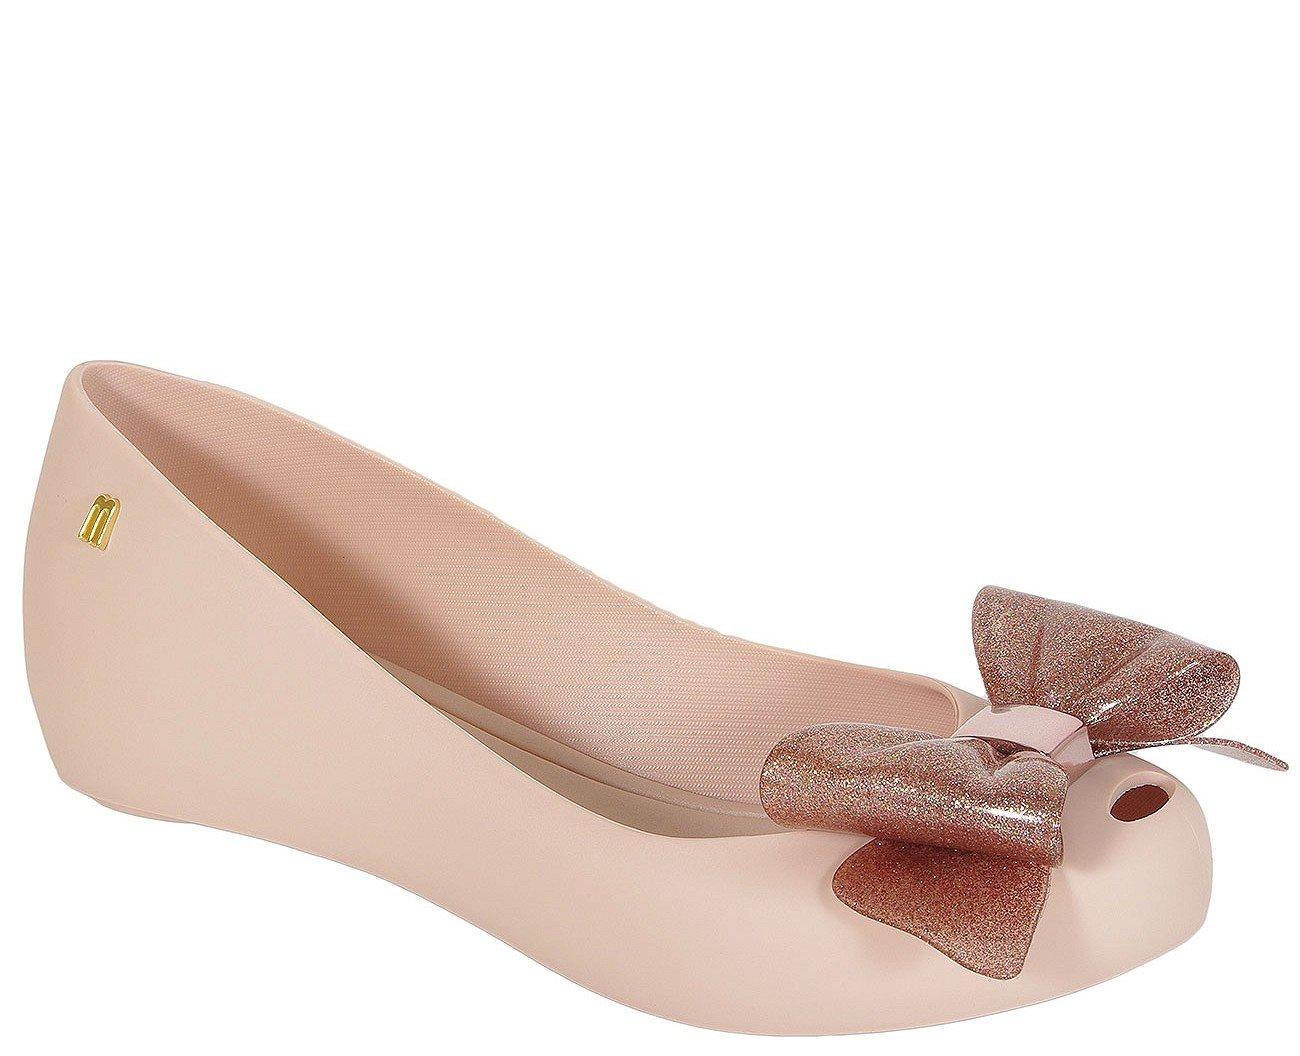 Melissa Ultragirl Sweet XIV baleriny Ad Light Pink